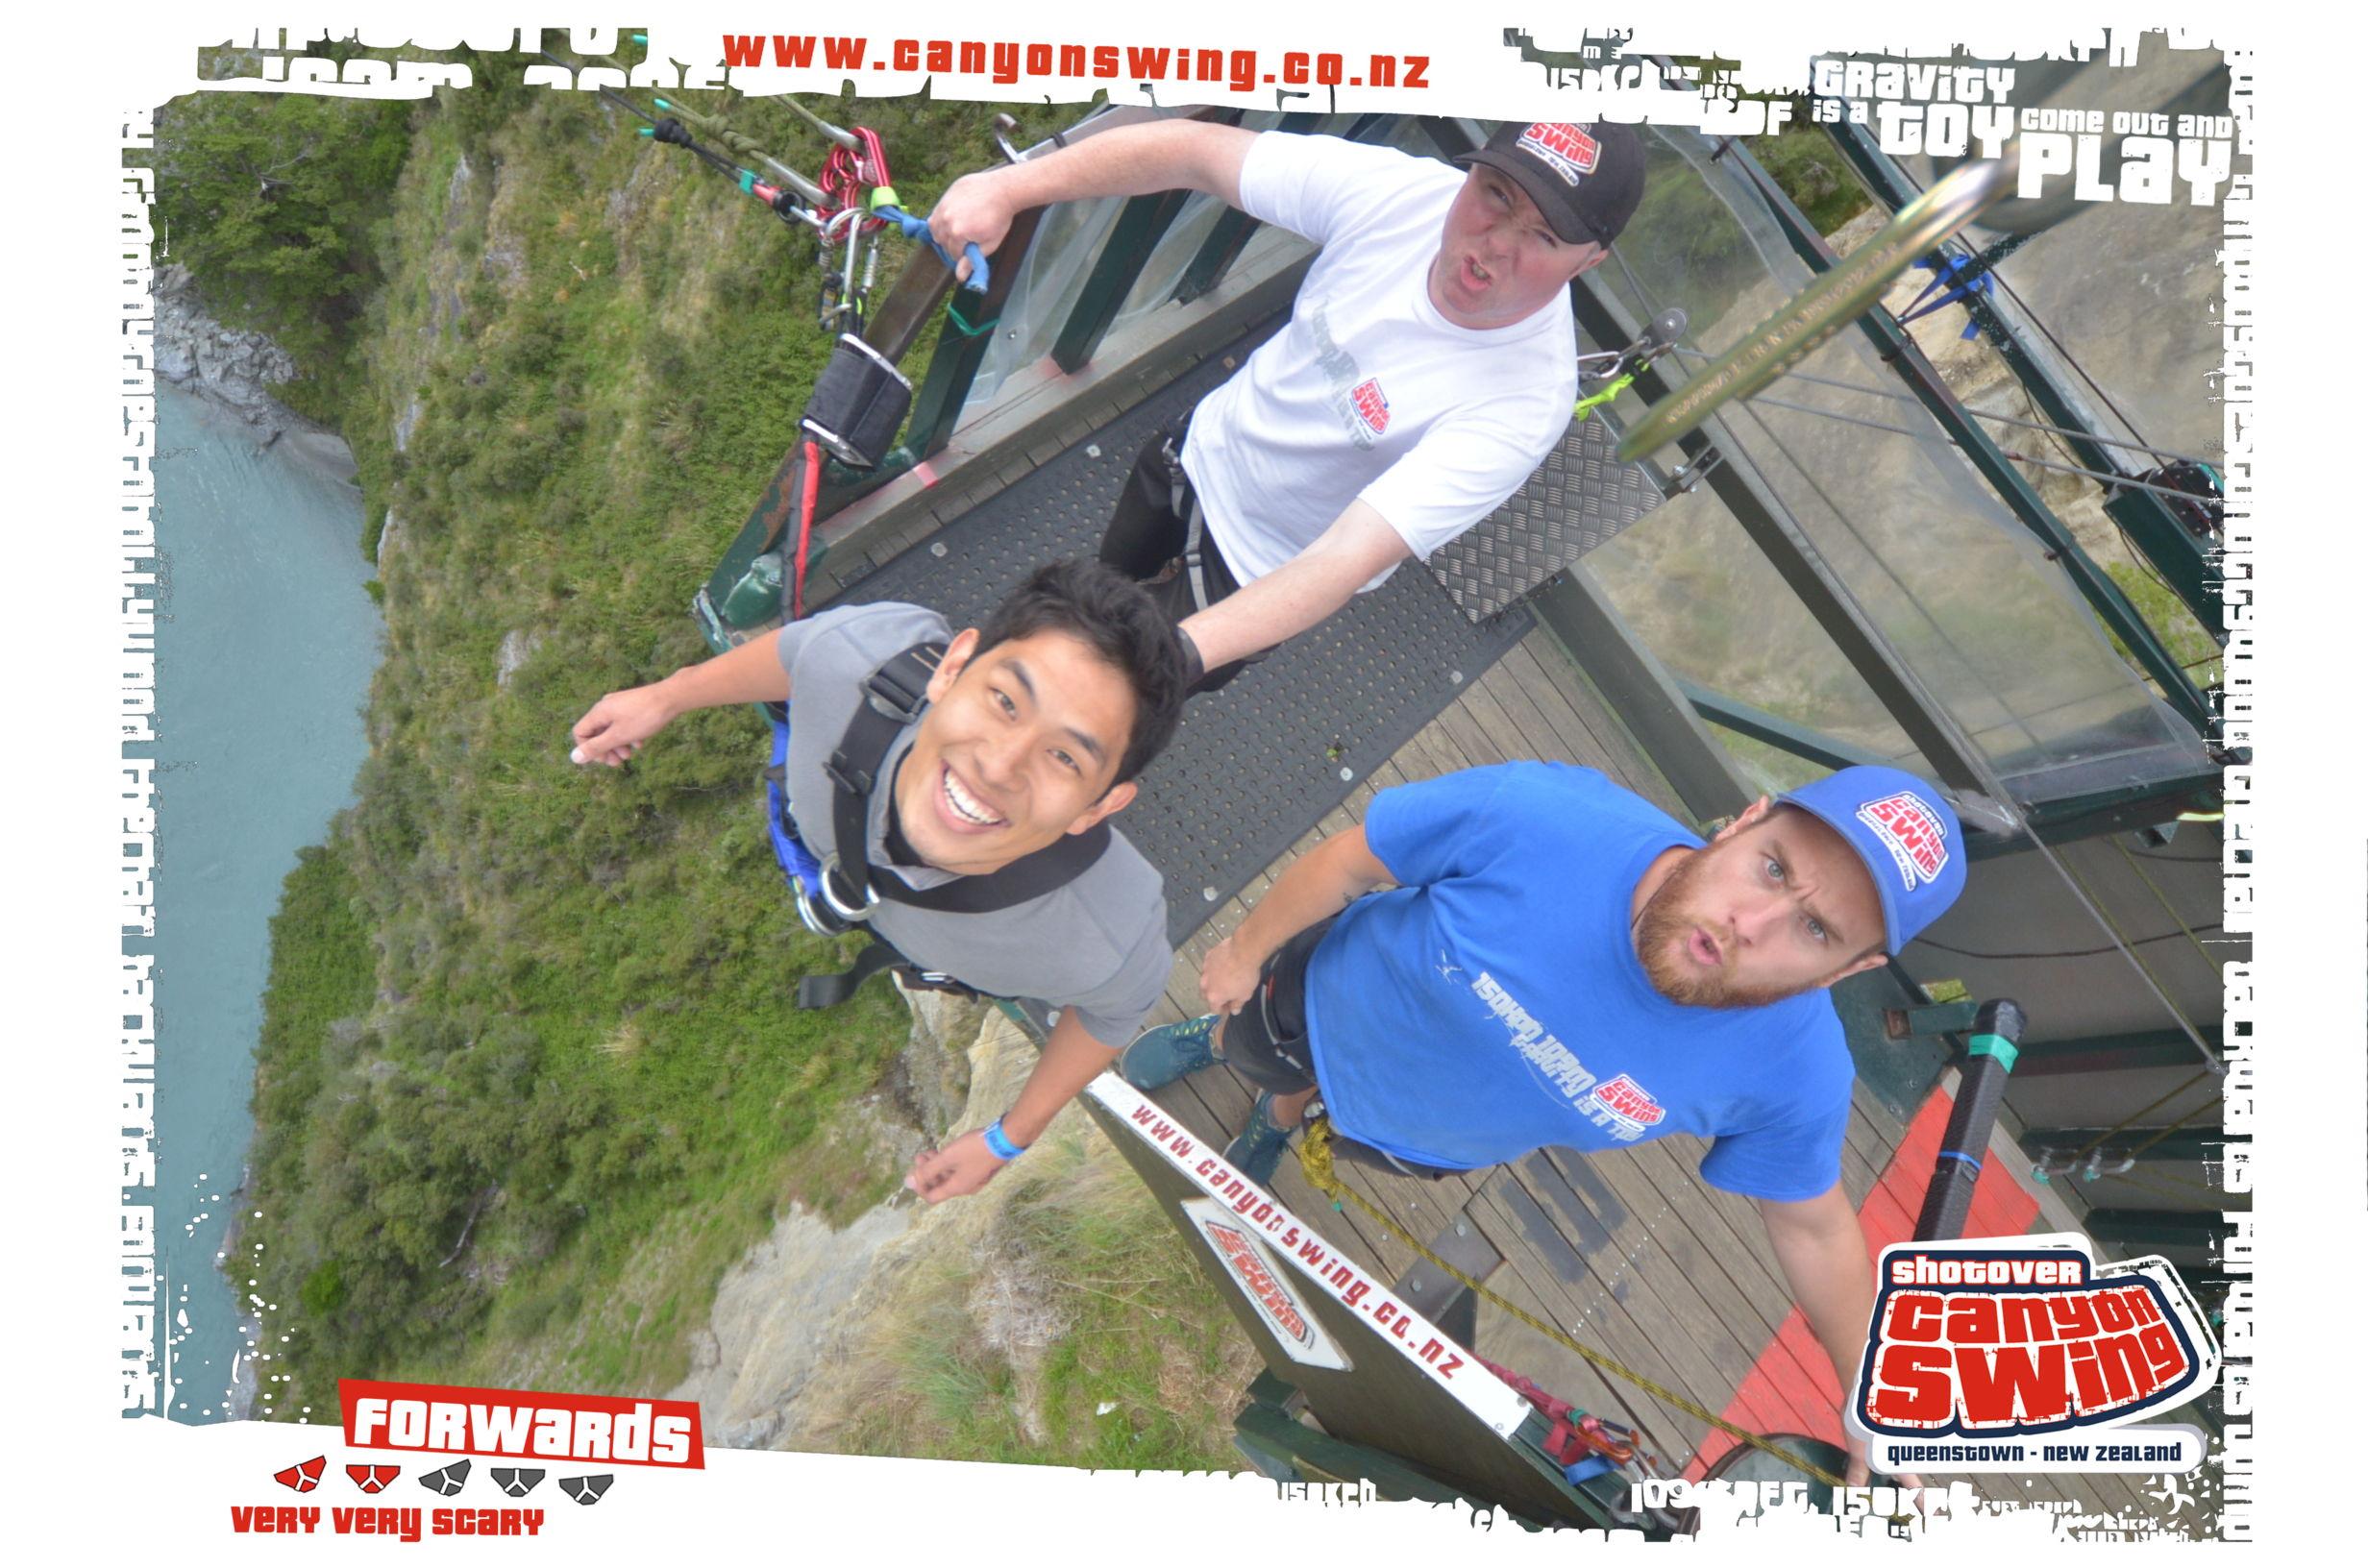 Swing 05 - Photo 03.jpg